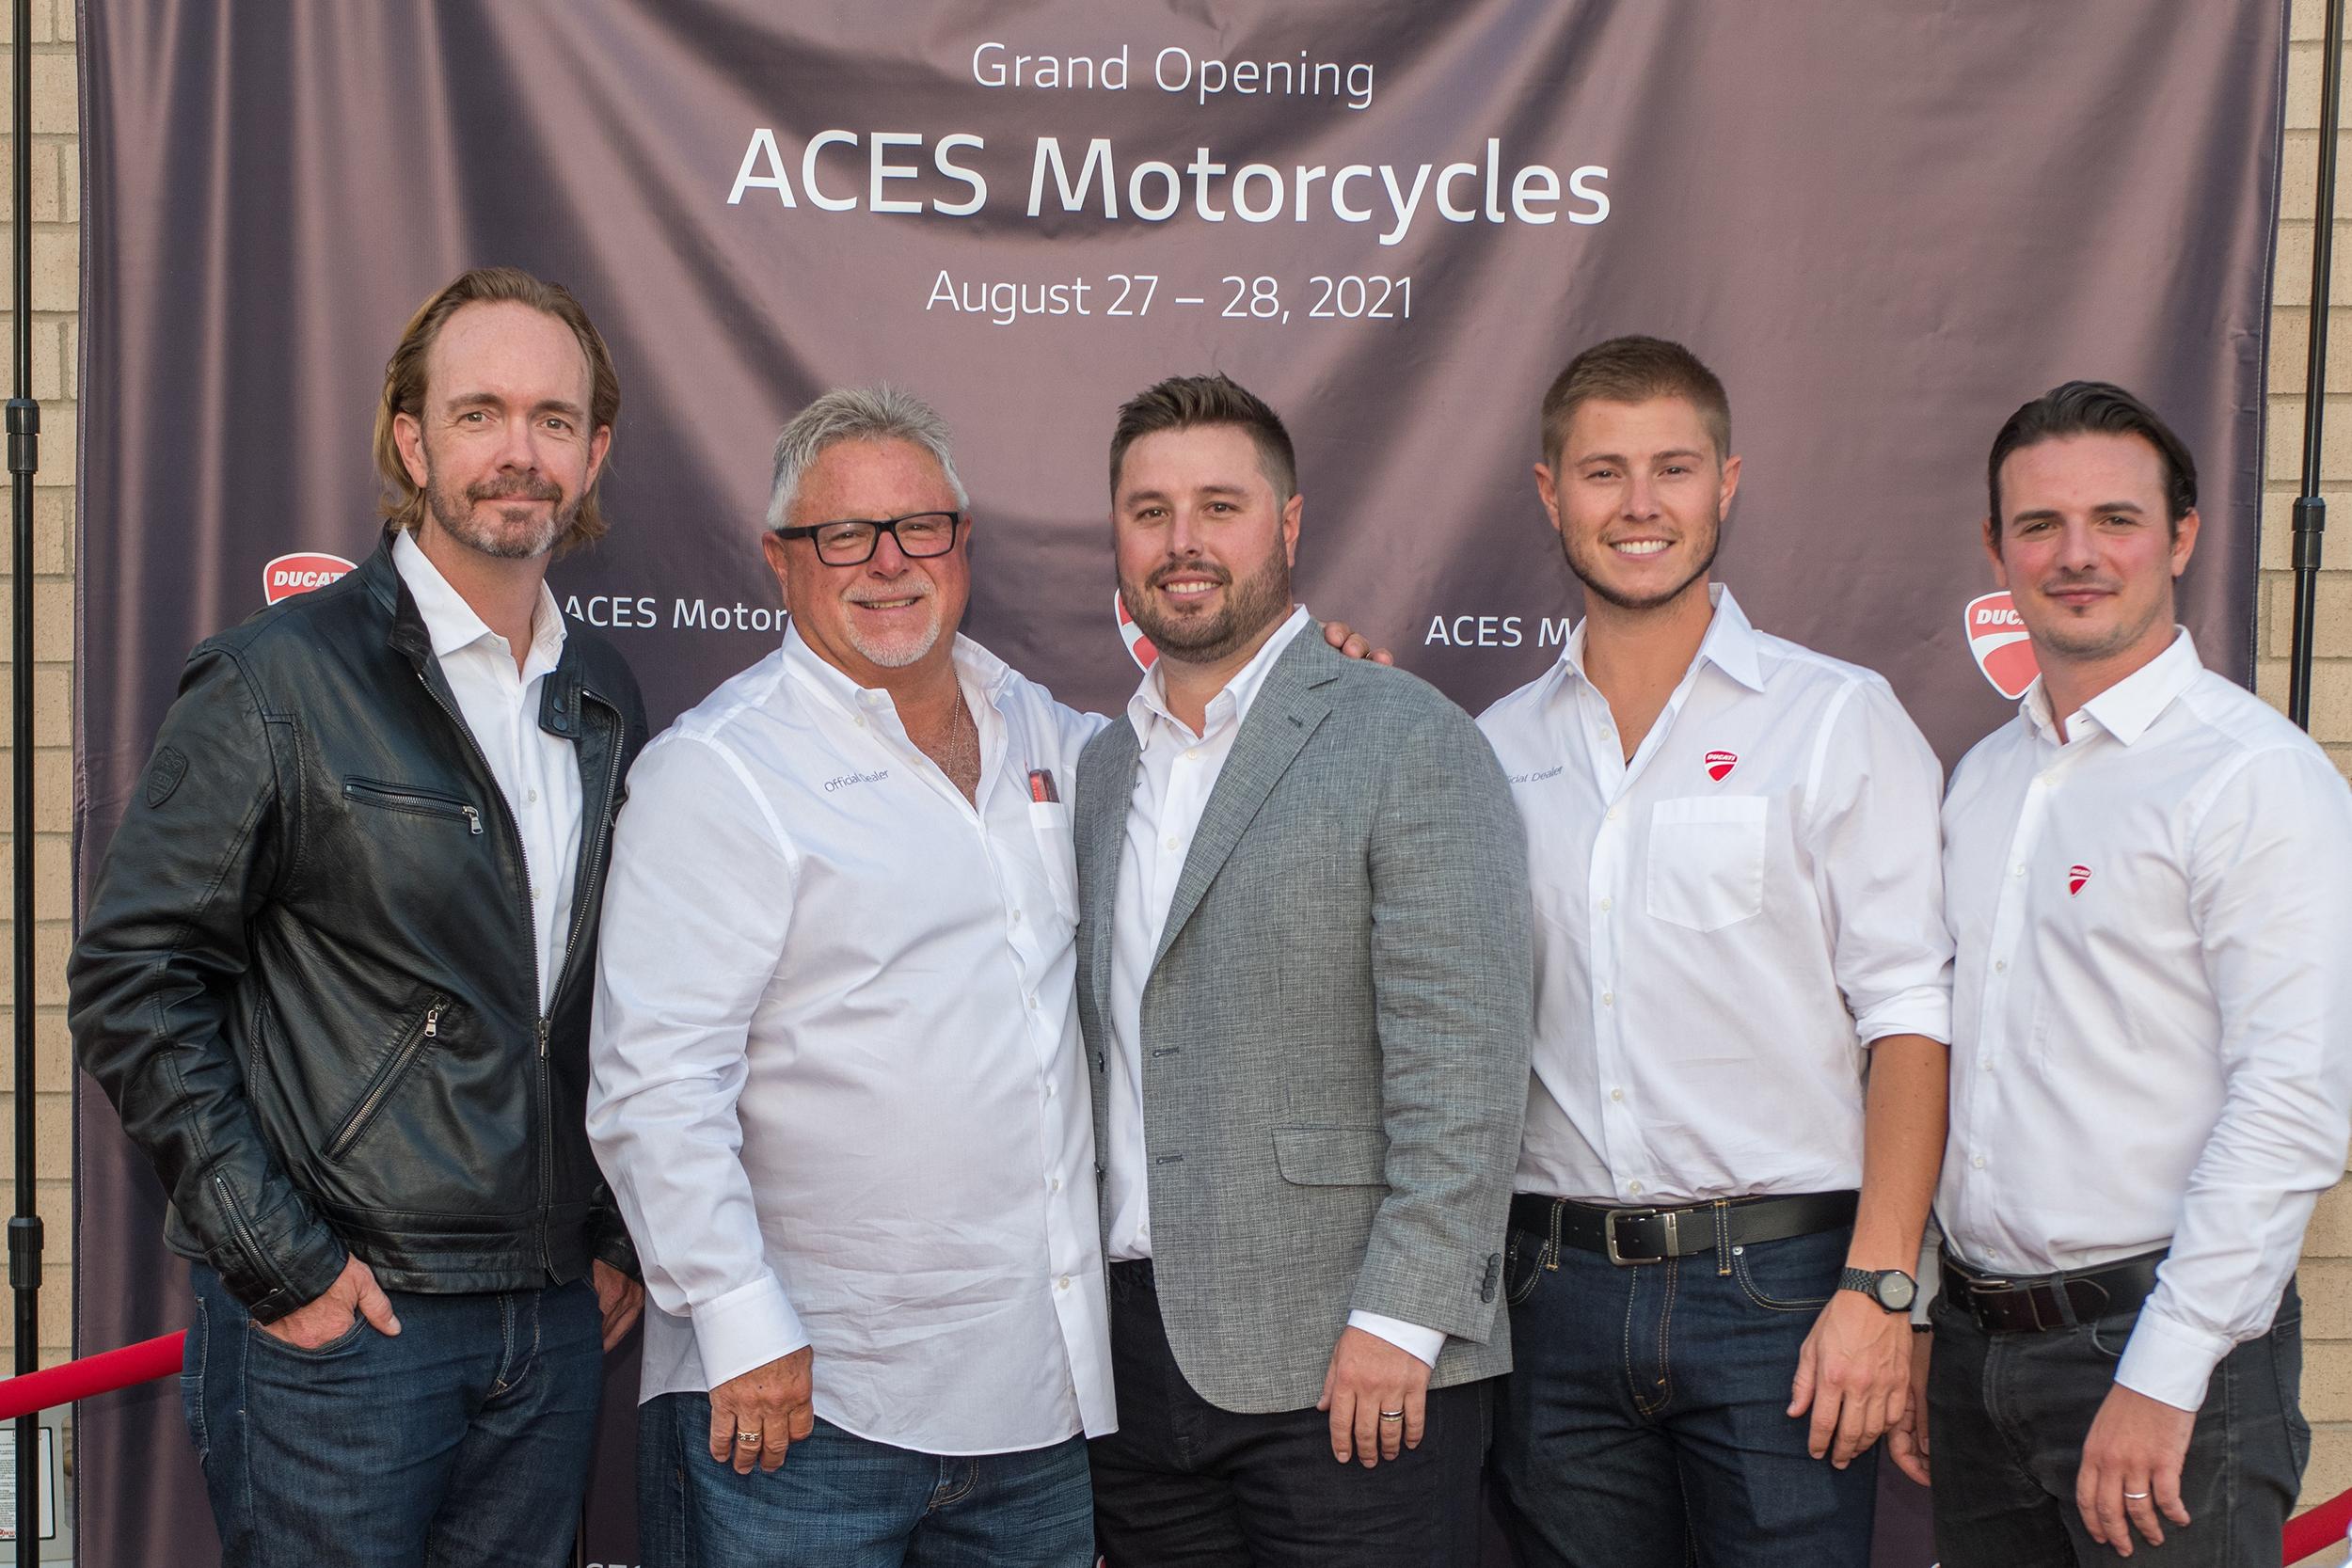 J. Chinnock (CEO DNA), K. Dimick (ACES Motorcycles President), D. Dimick (ACES Motorcycles General Manager), C. Dimick, F. Esposito (RBM DNA)